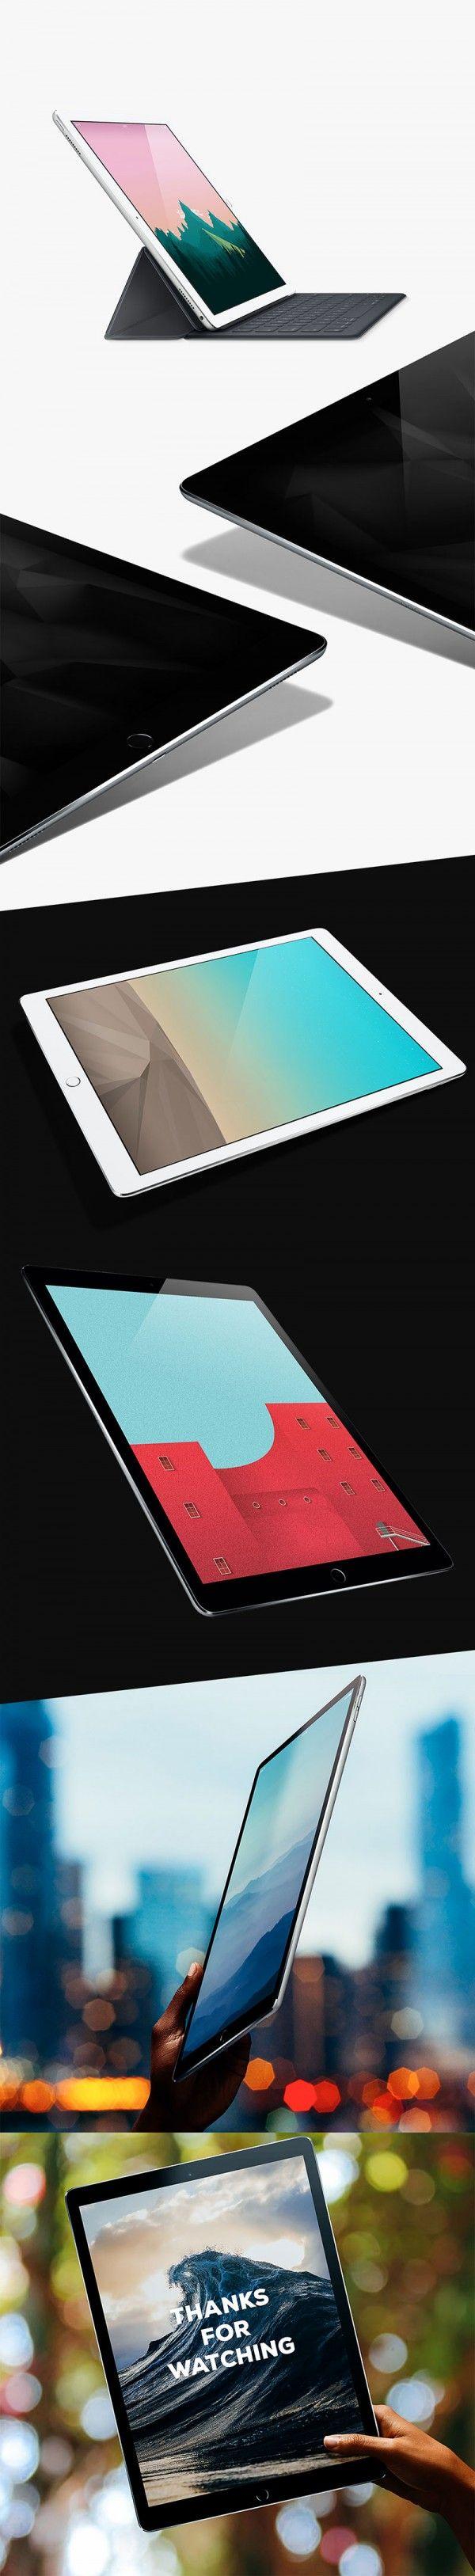 iPad Pro Mockups Free